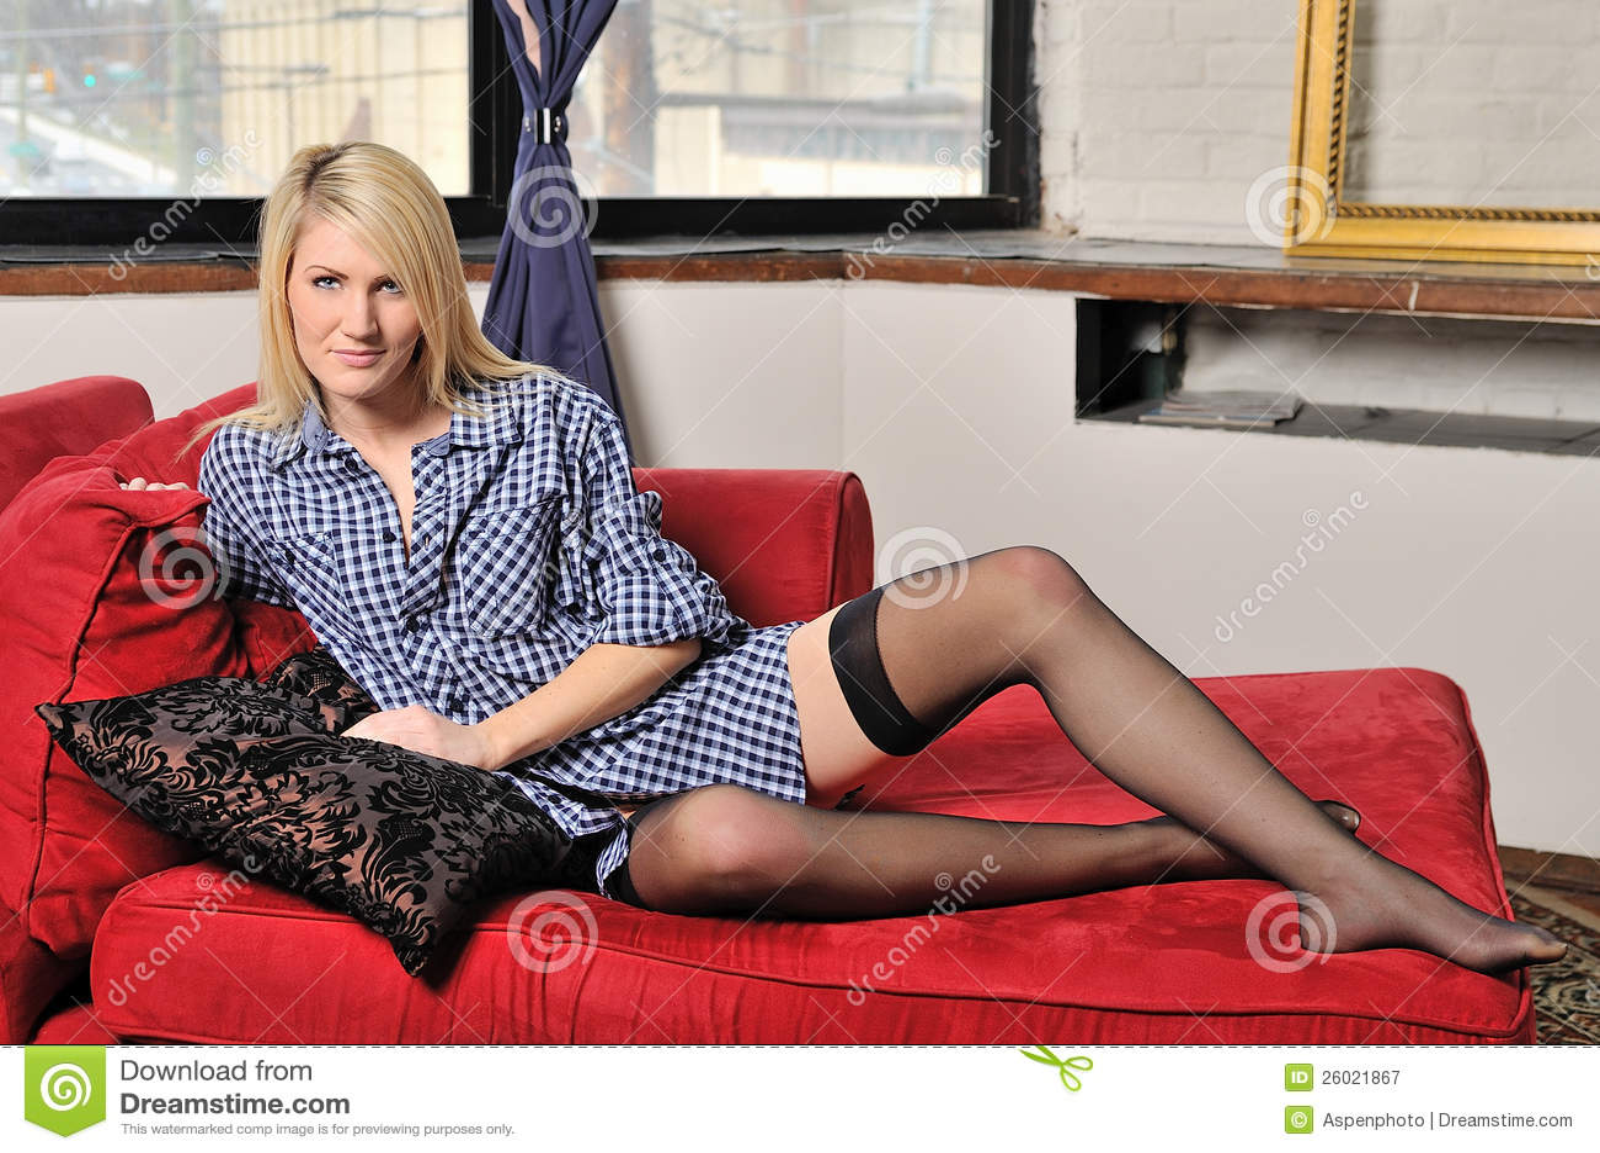 geile amateur girls sex fuck